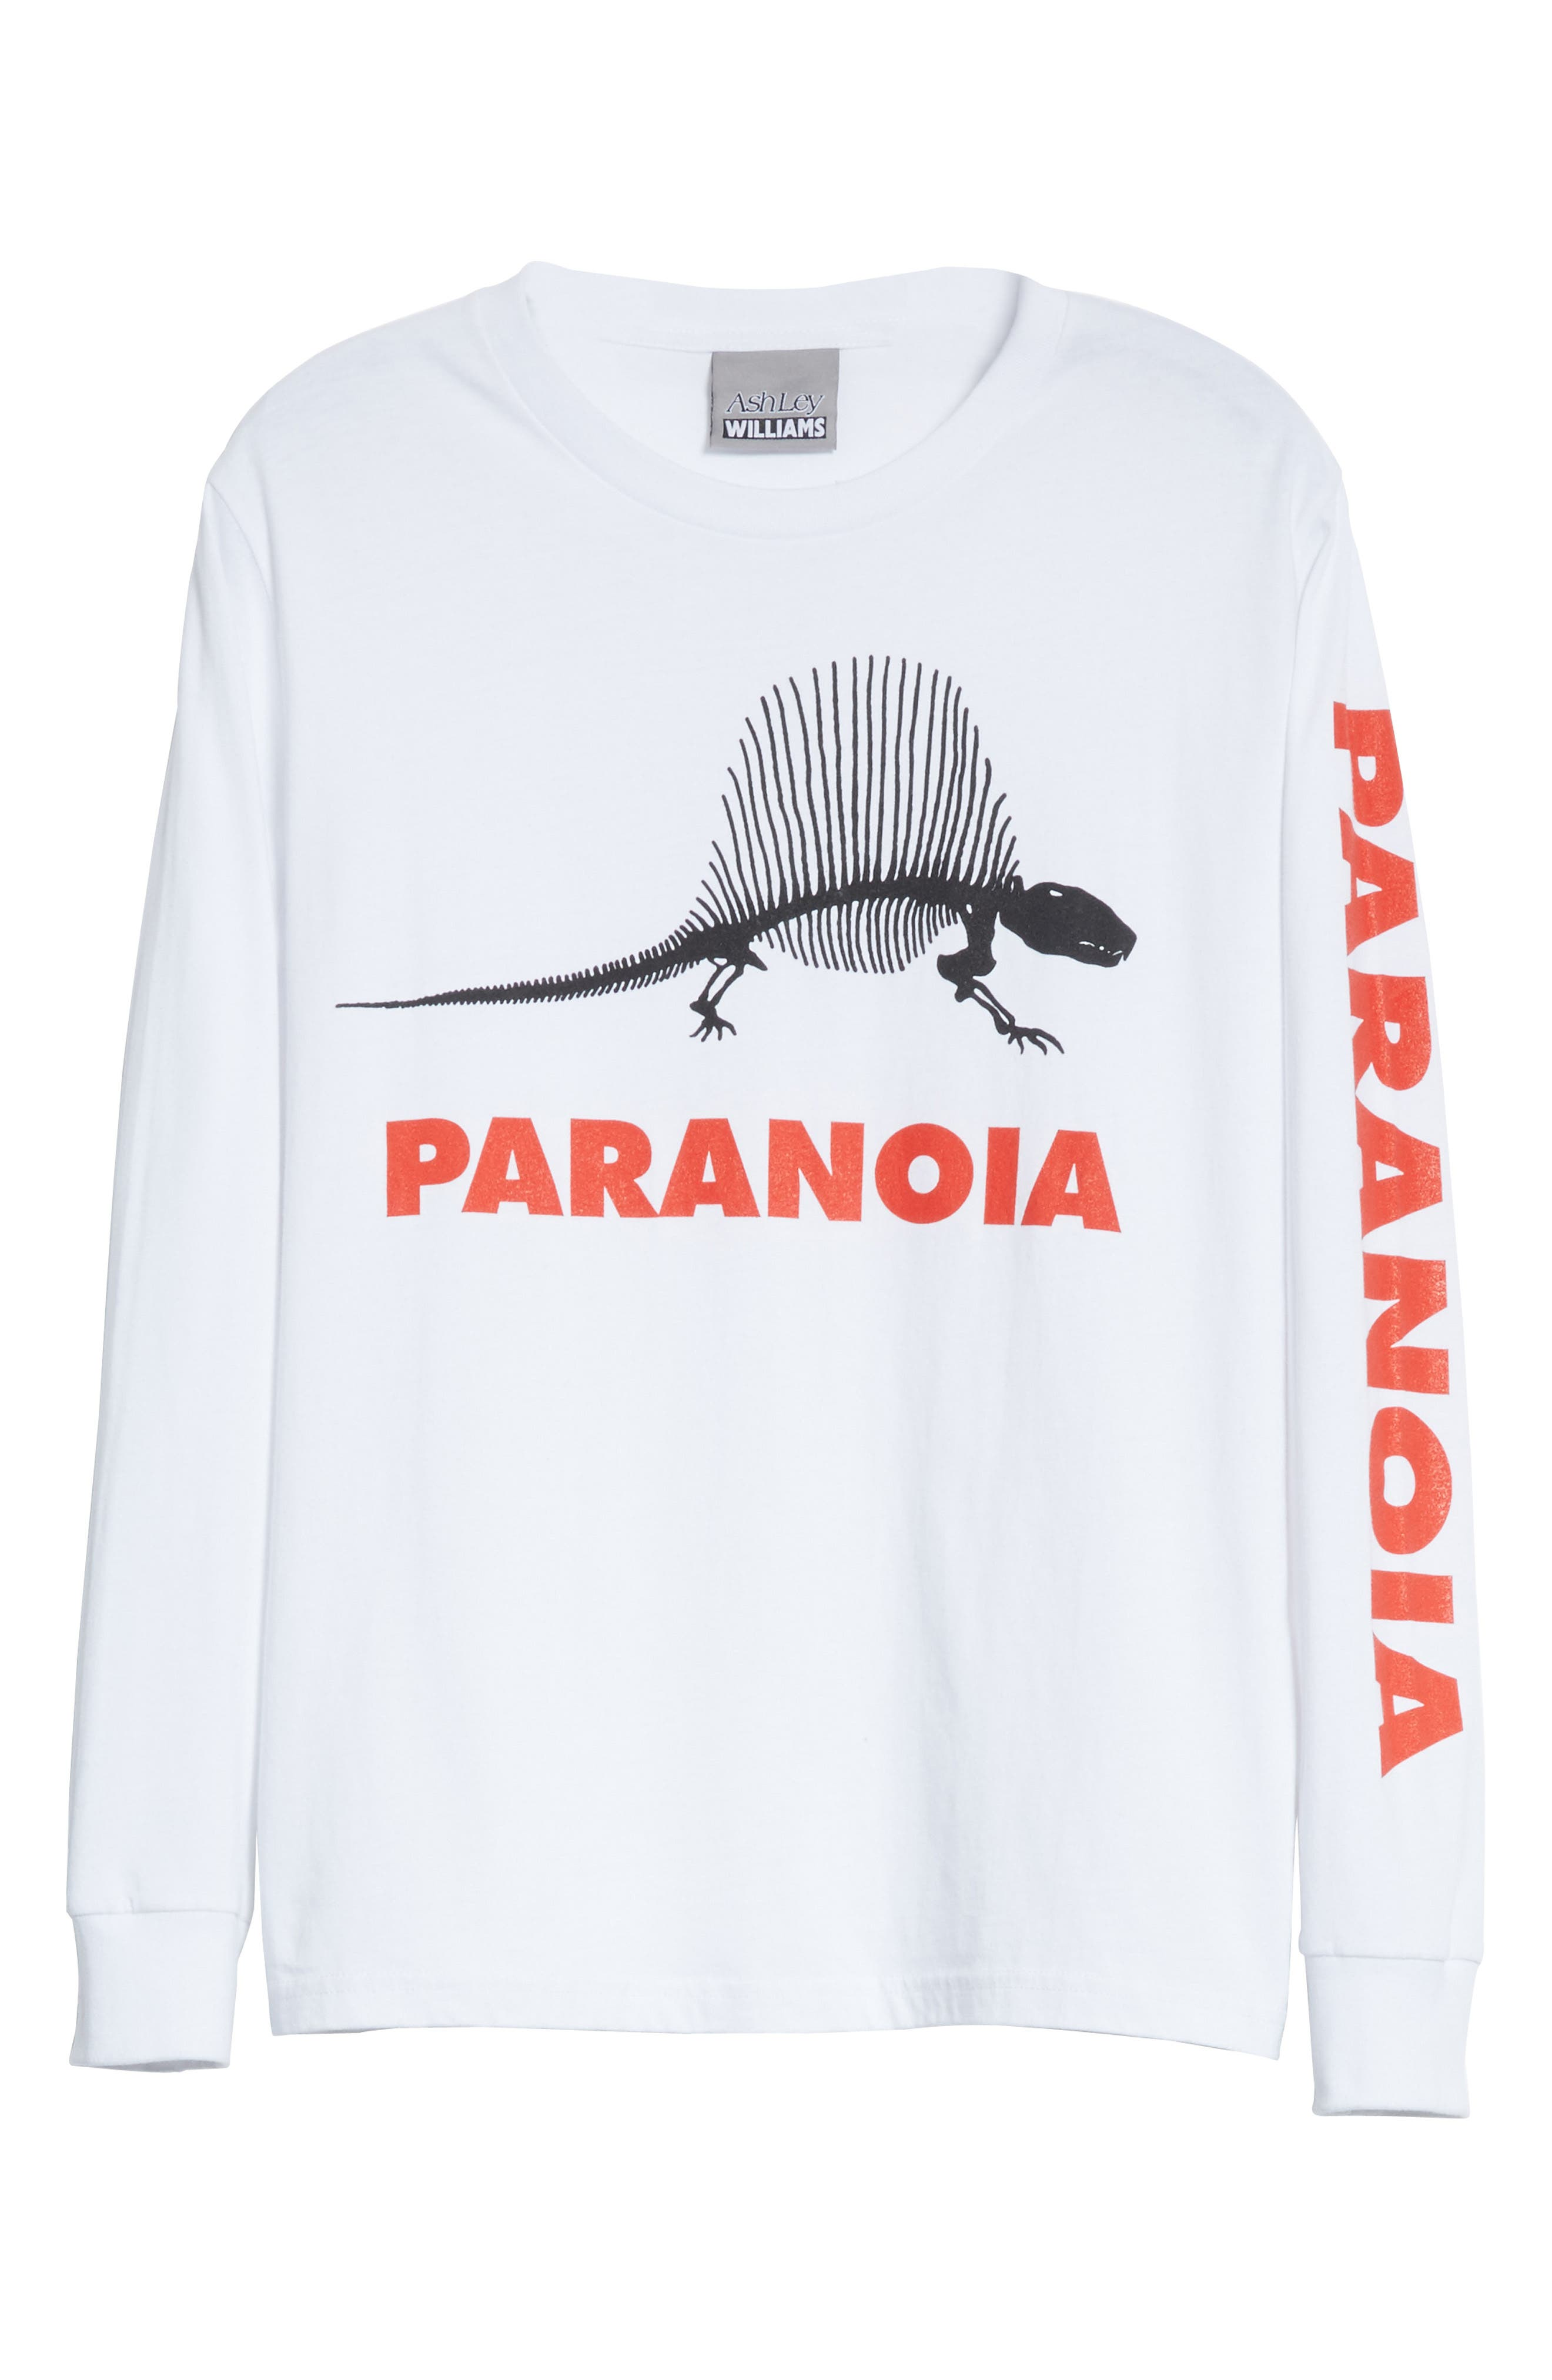 Paranoia Long Sleeve Tee,                             Alternate thumbnail 7, color,                             White